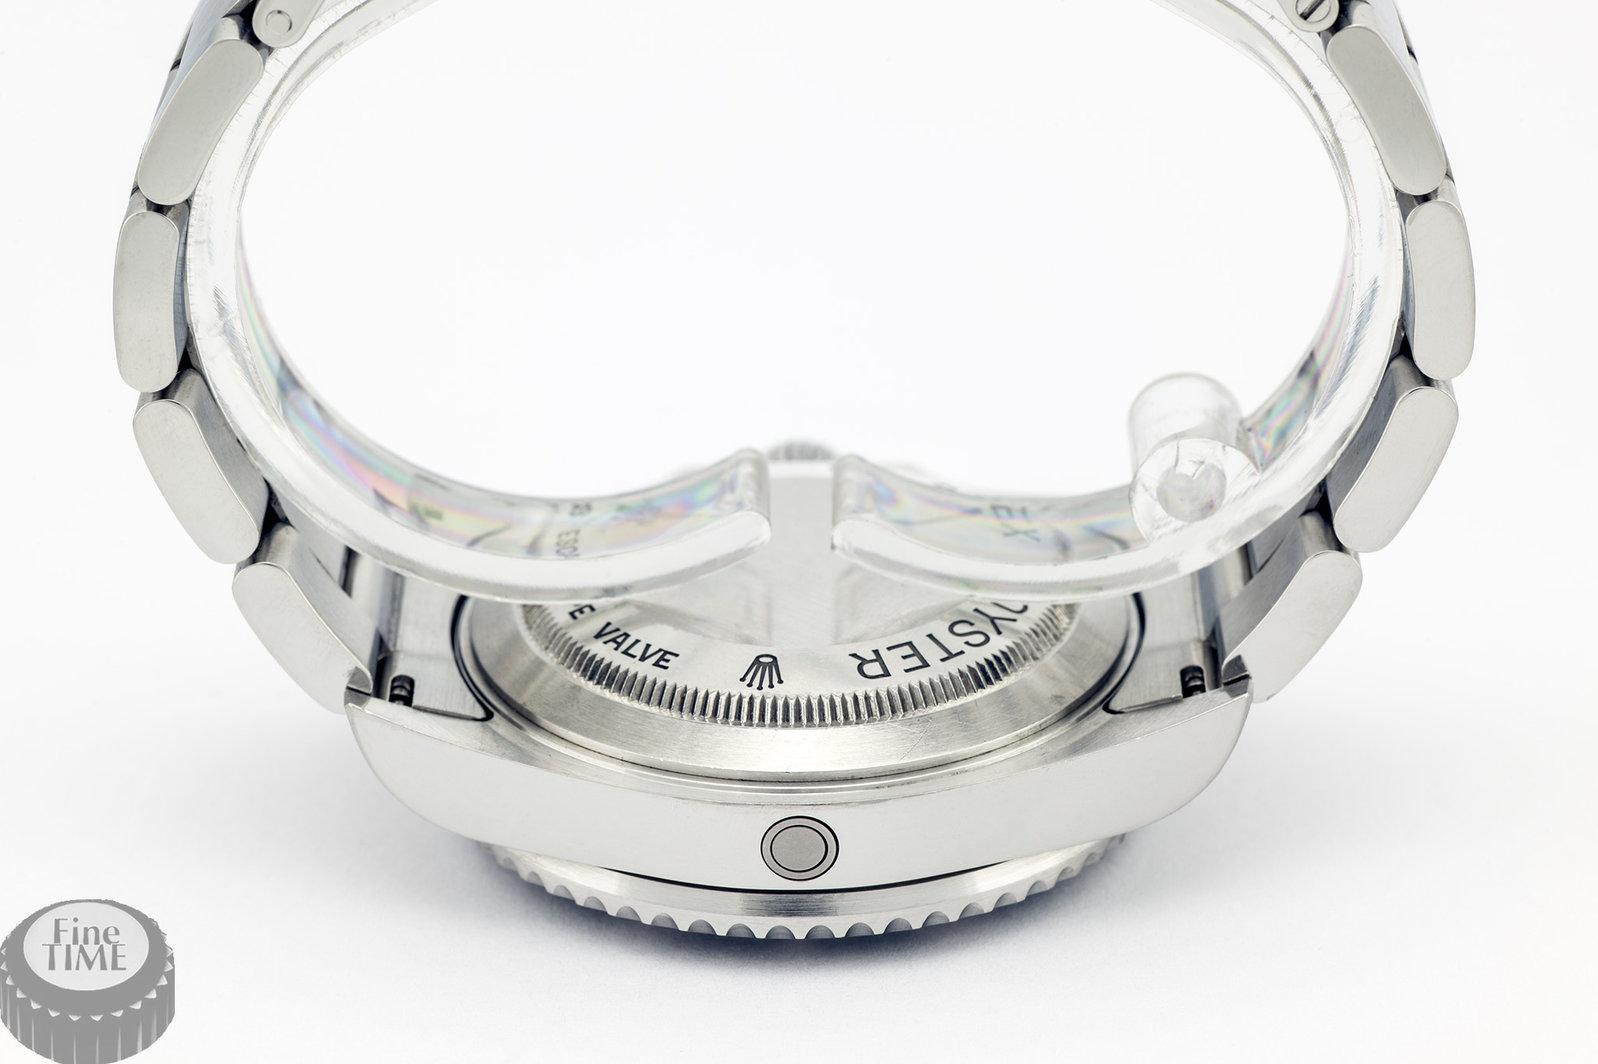 rolex-seadweller-16600-m-04.jpg